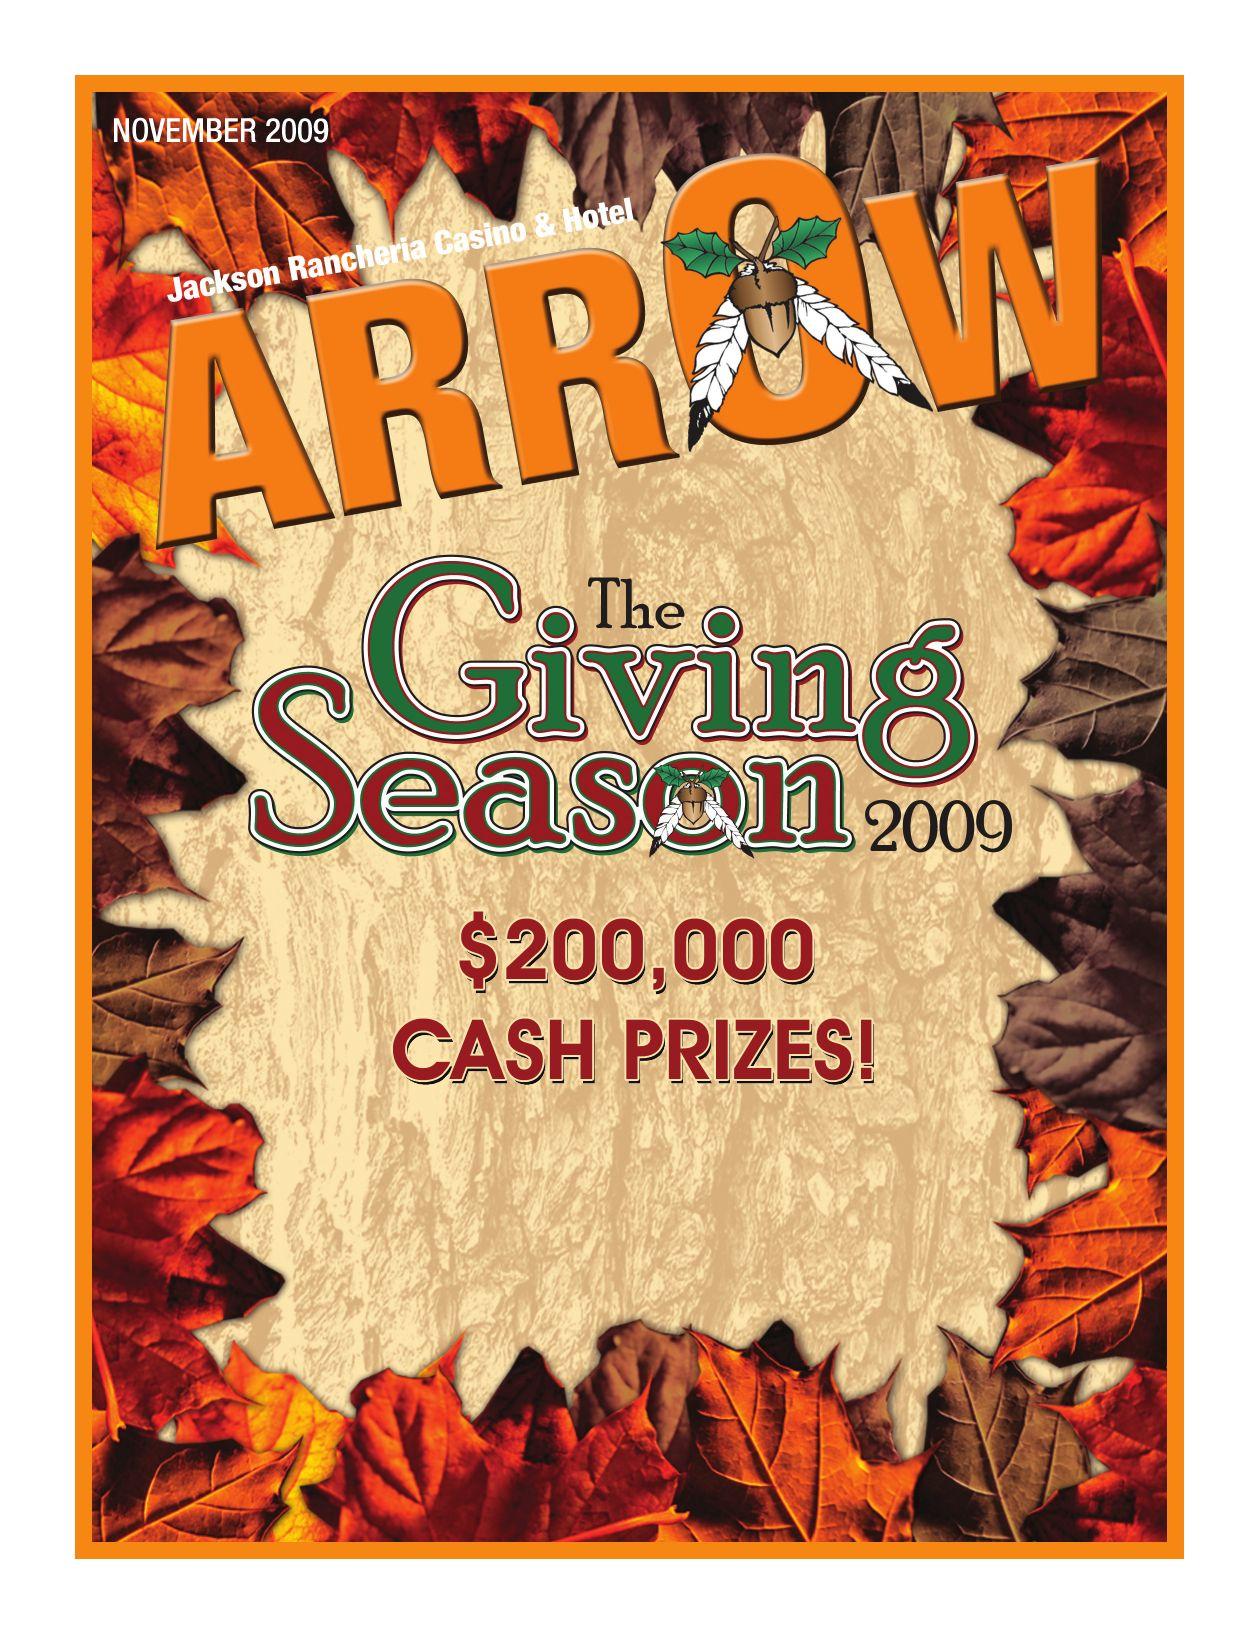 Jackson rancheria casino coupons